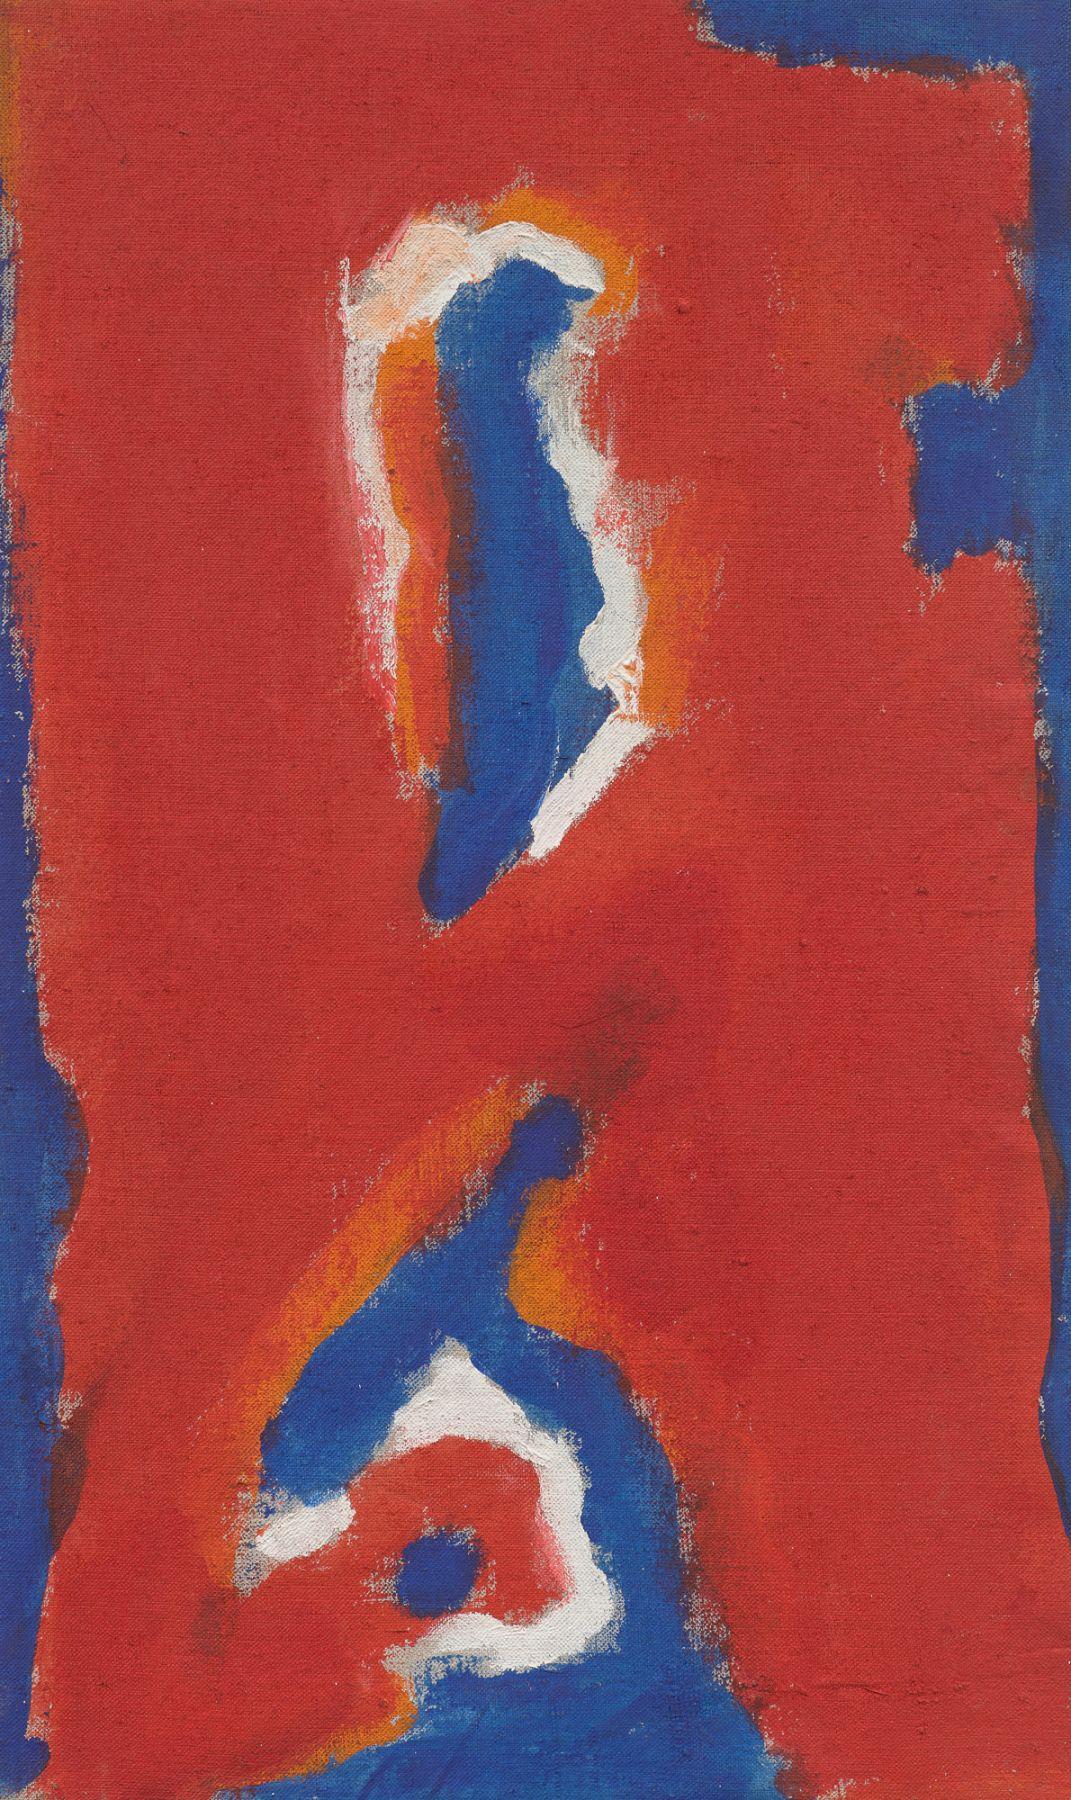 Red Sea, 1963, Acrylic on linen